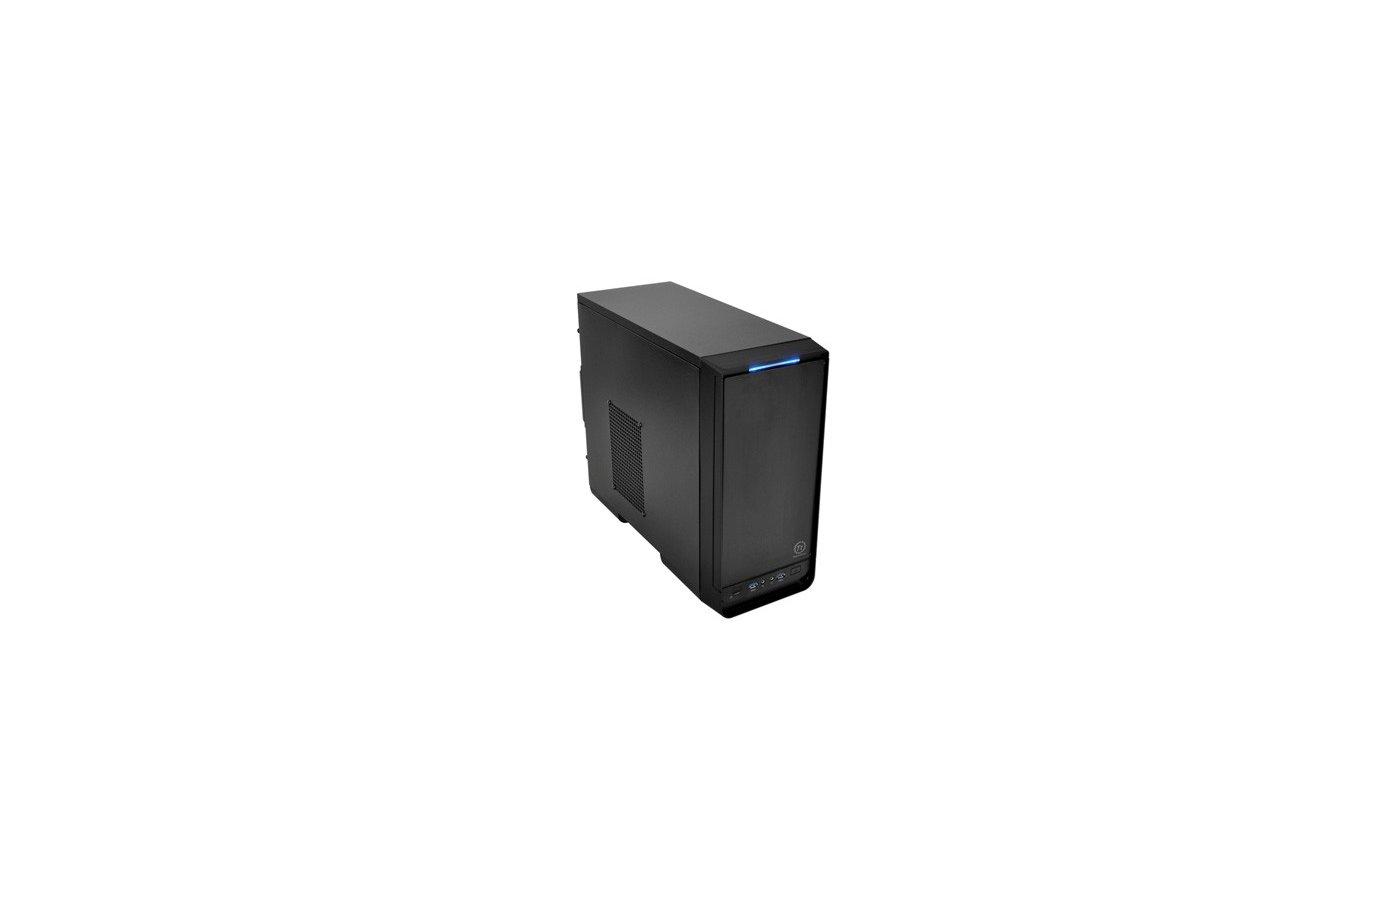 Корпус Thermaltake Urban S1 черный без БП mATX 1x80mm 1x92mm 1x120mm 2xUSB3.0 audio front door